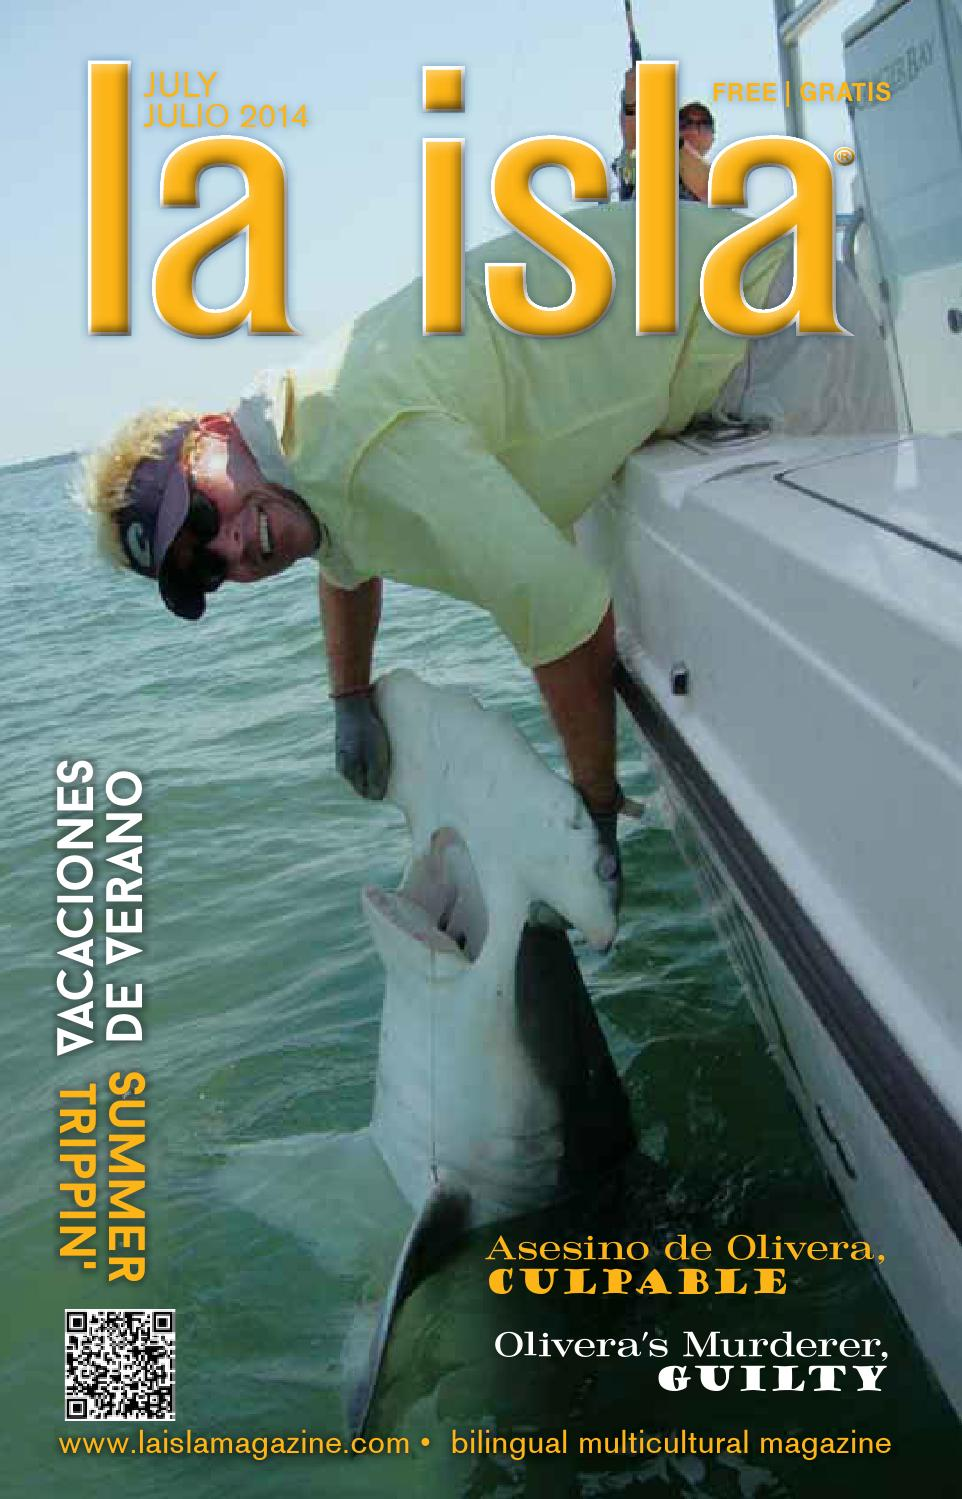 La Isla Magazine July 2014 by E & F Publishing - issuu